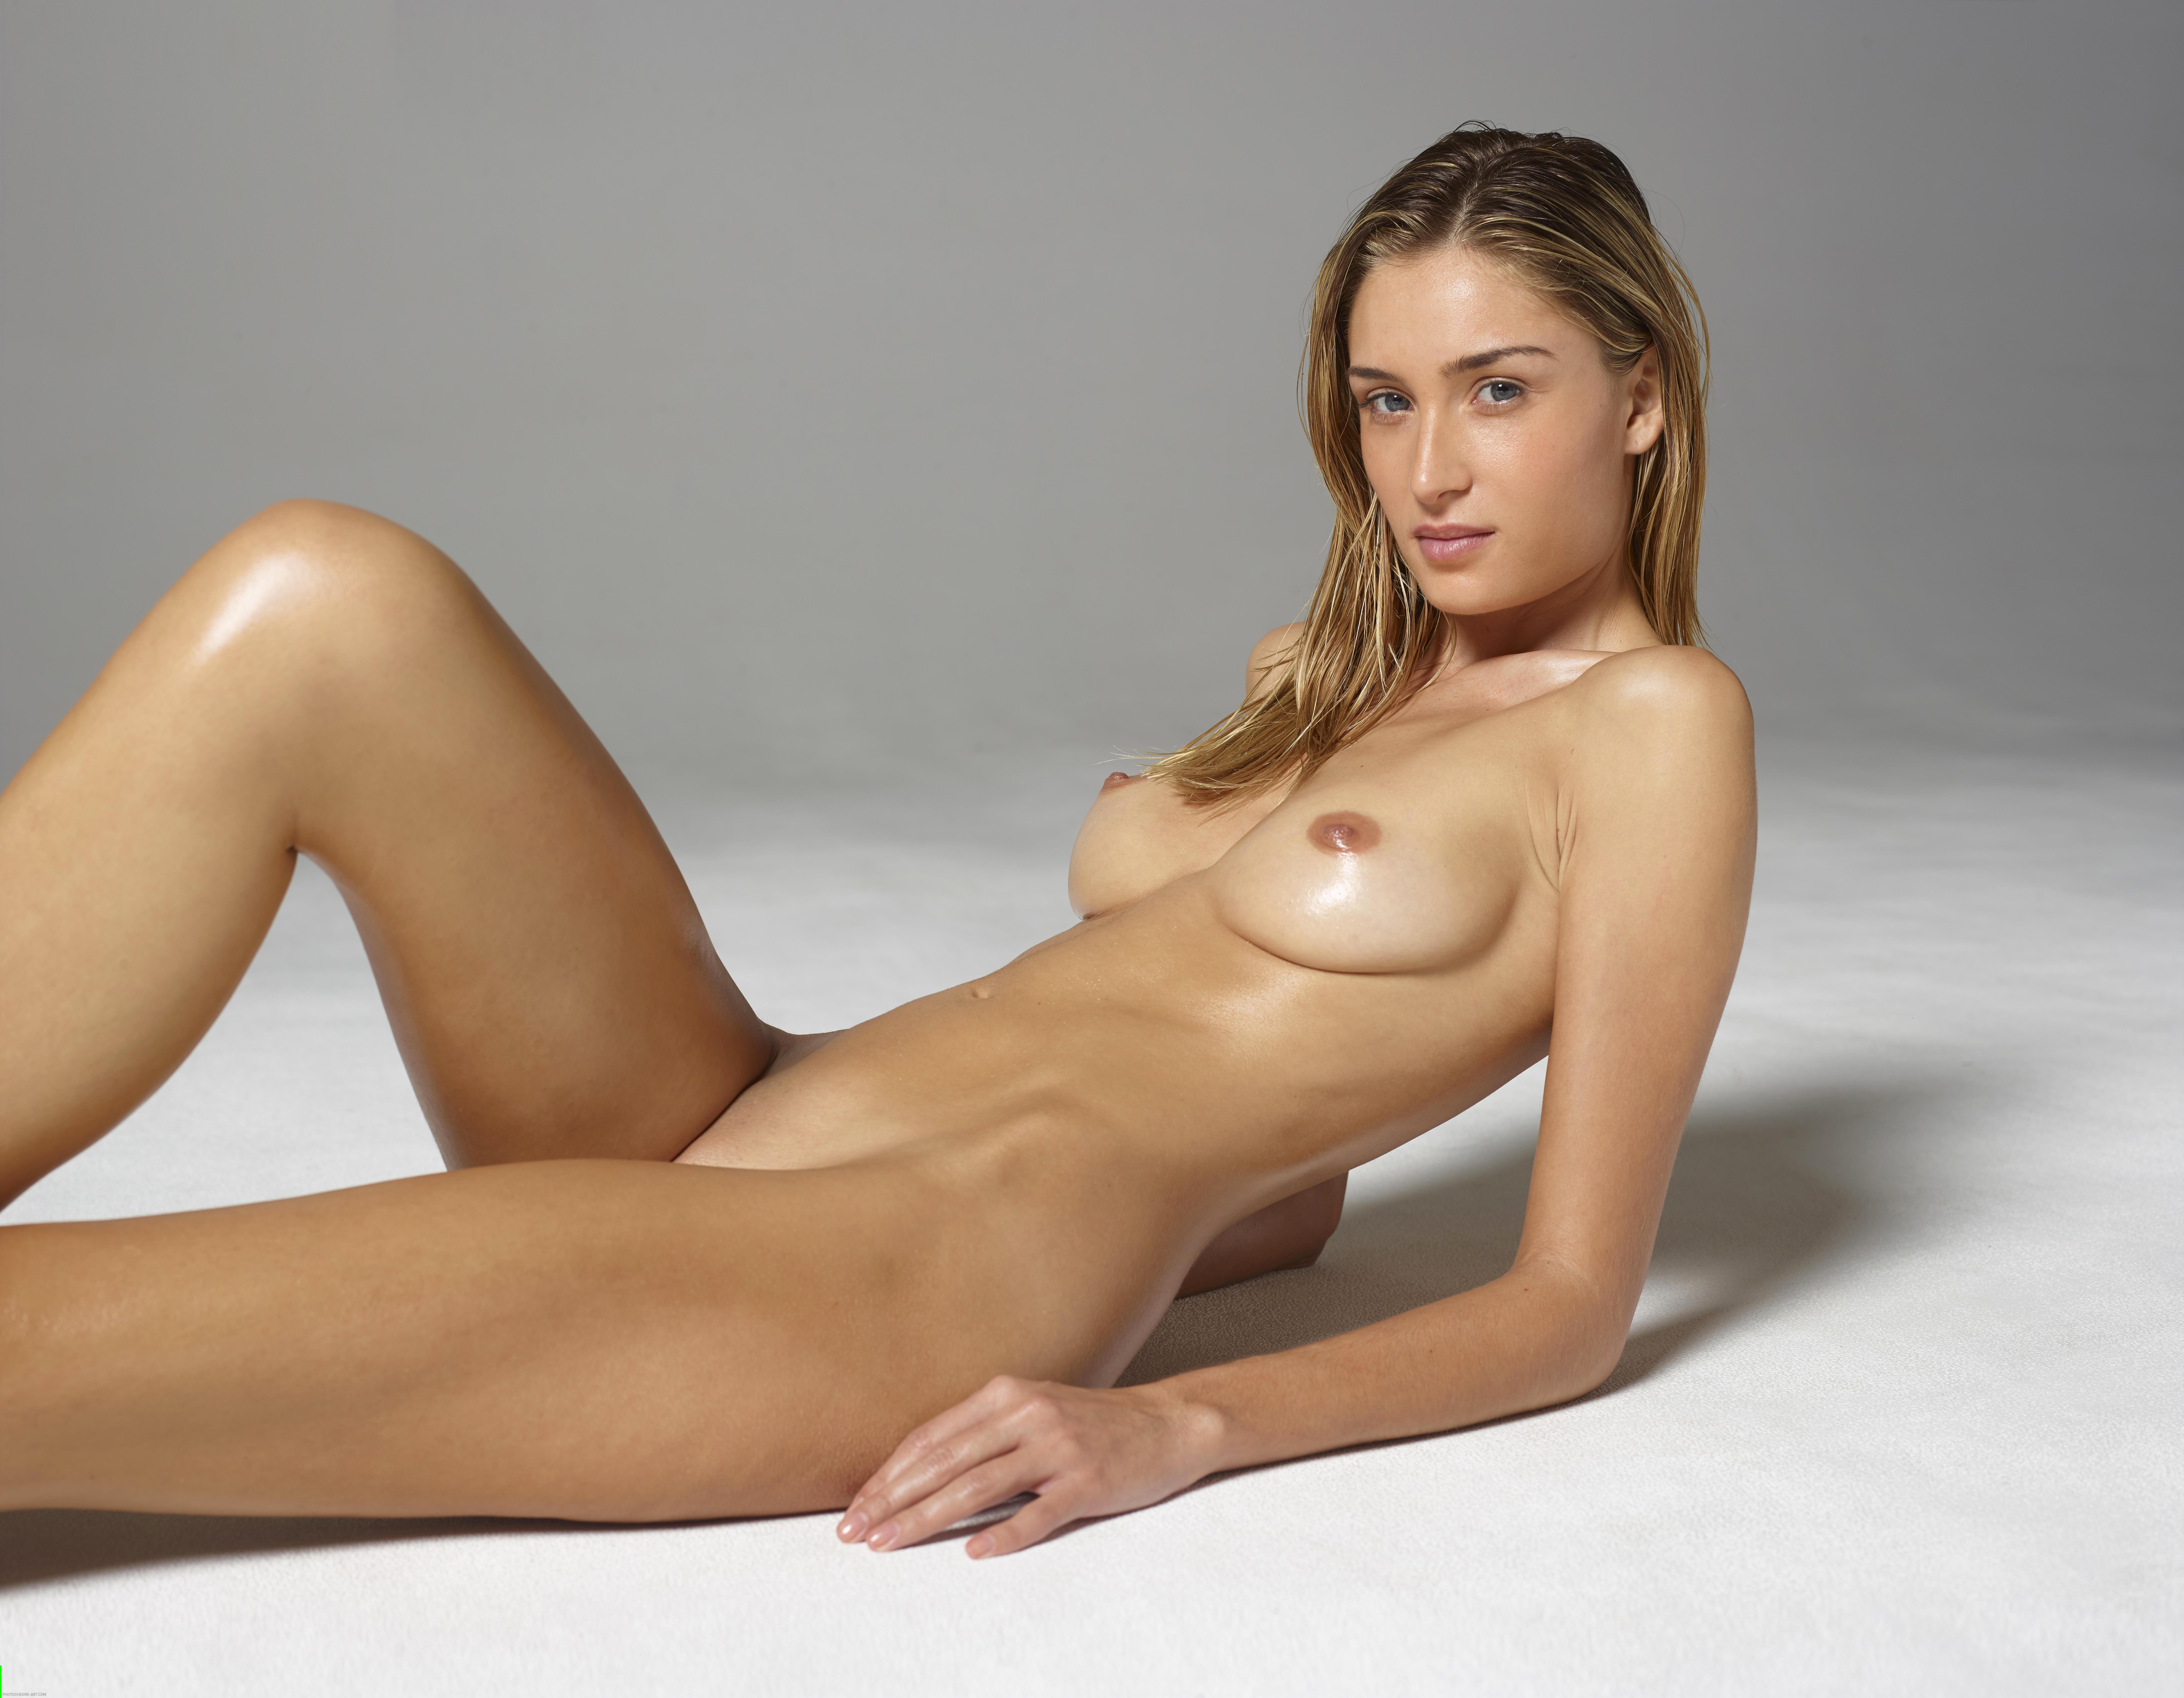 Hottest female supermodels naked